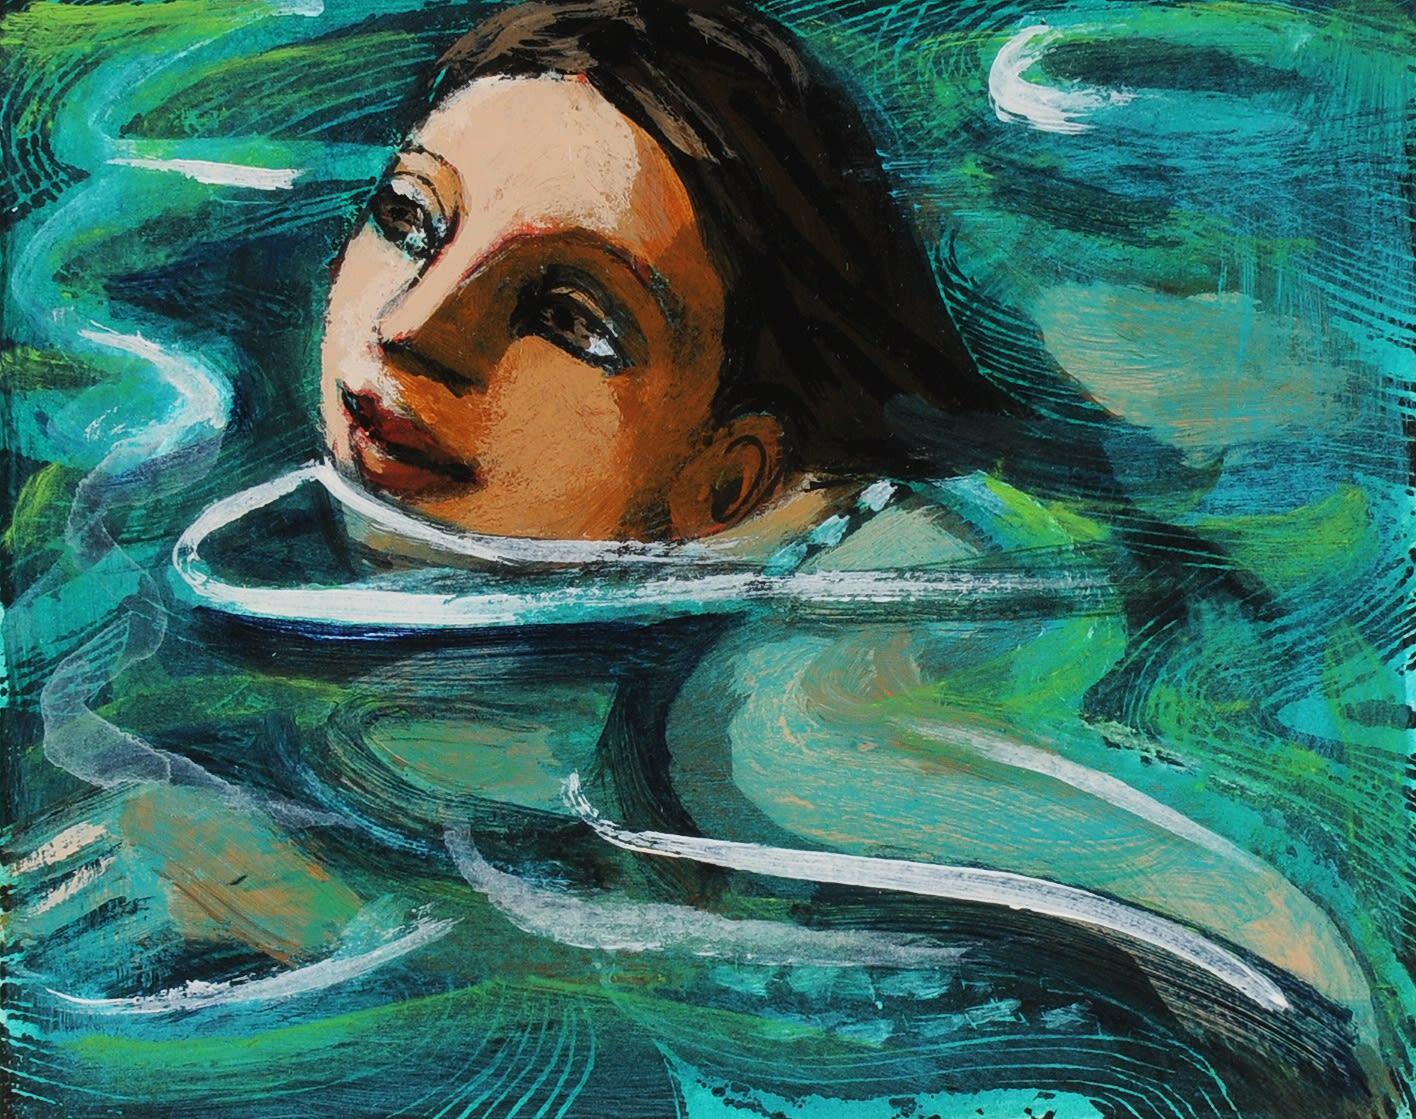 Anita Klein, Swimming in Cold Water II, 2020